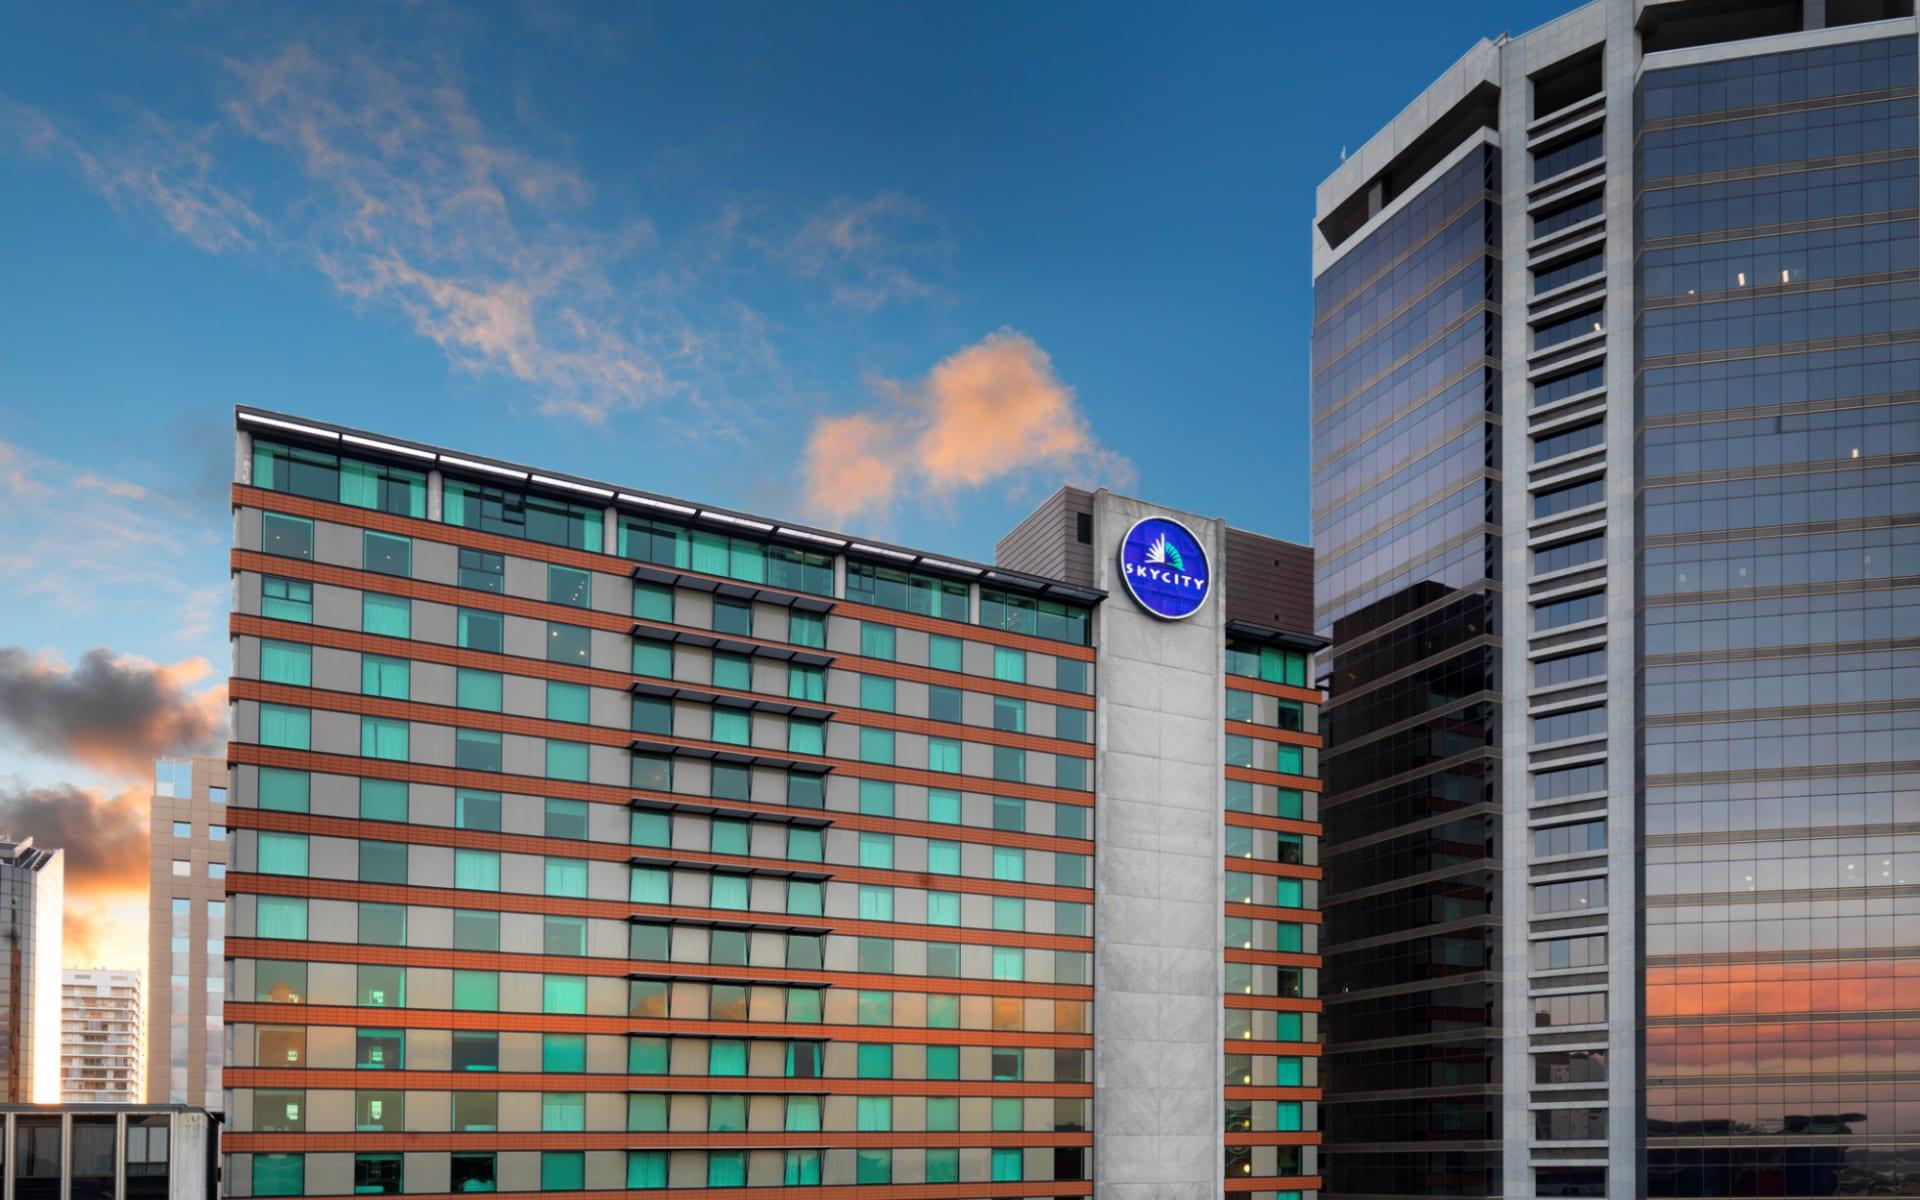 Skycity Grand Hotel in Auckland:  Skycity Grand Hotel - Aussenansicht